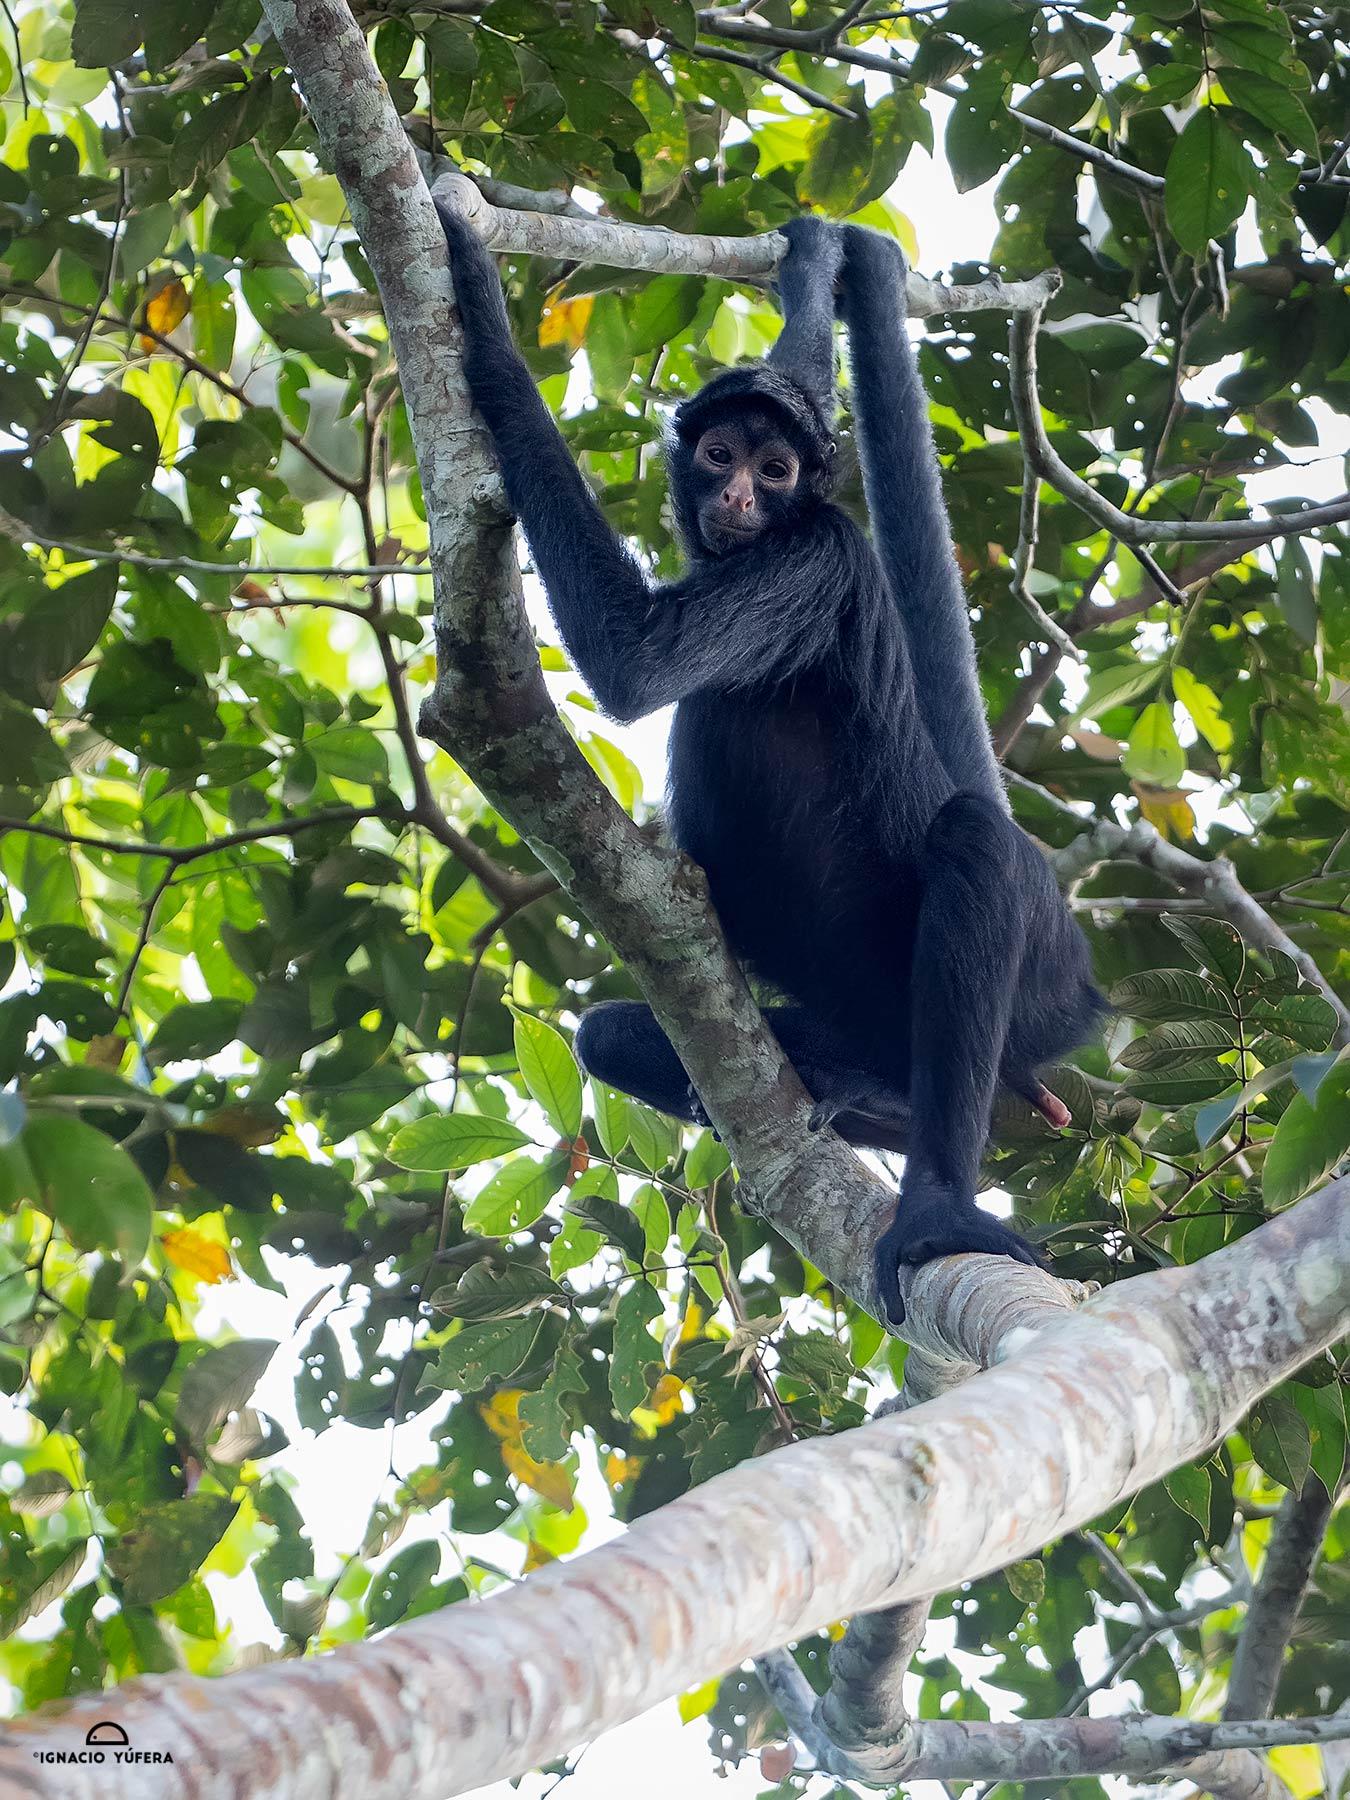 Peruvian Spider Monkey (Ateles chamek), Madre de Dios, Peru